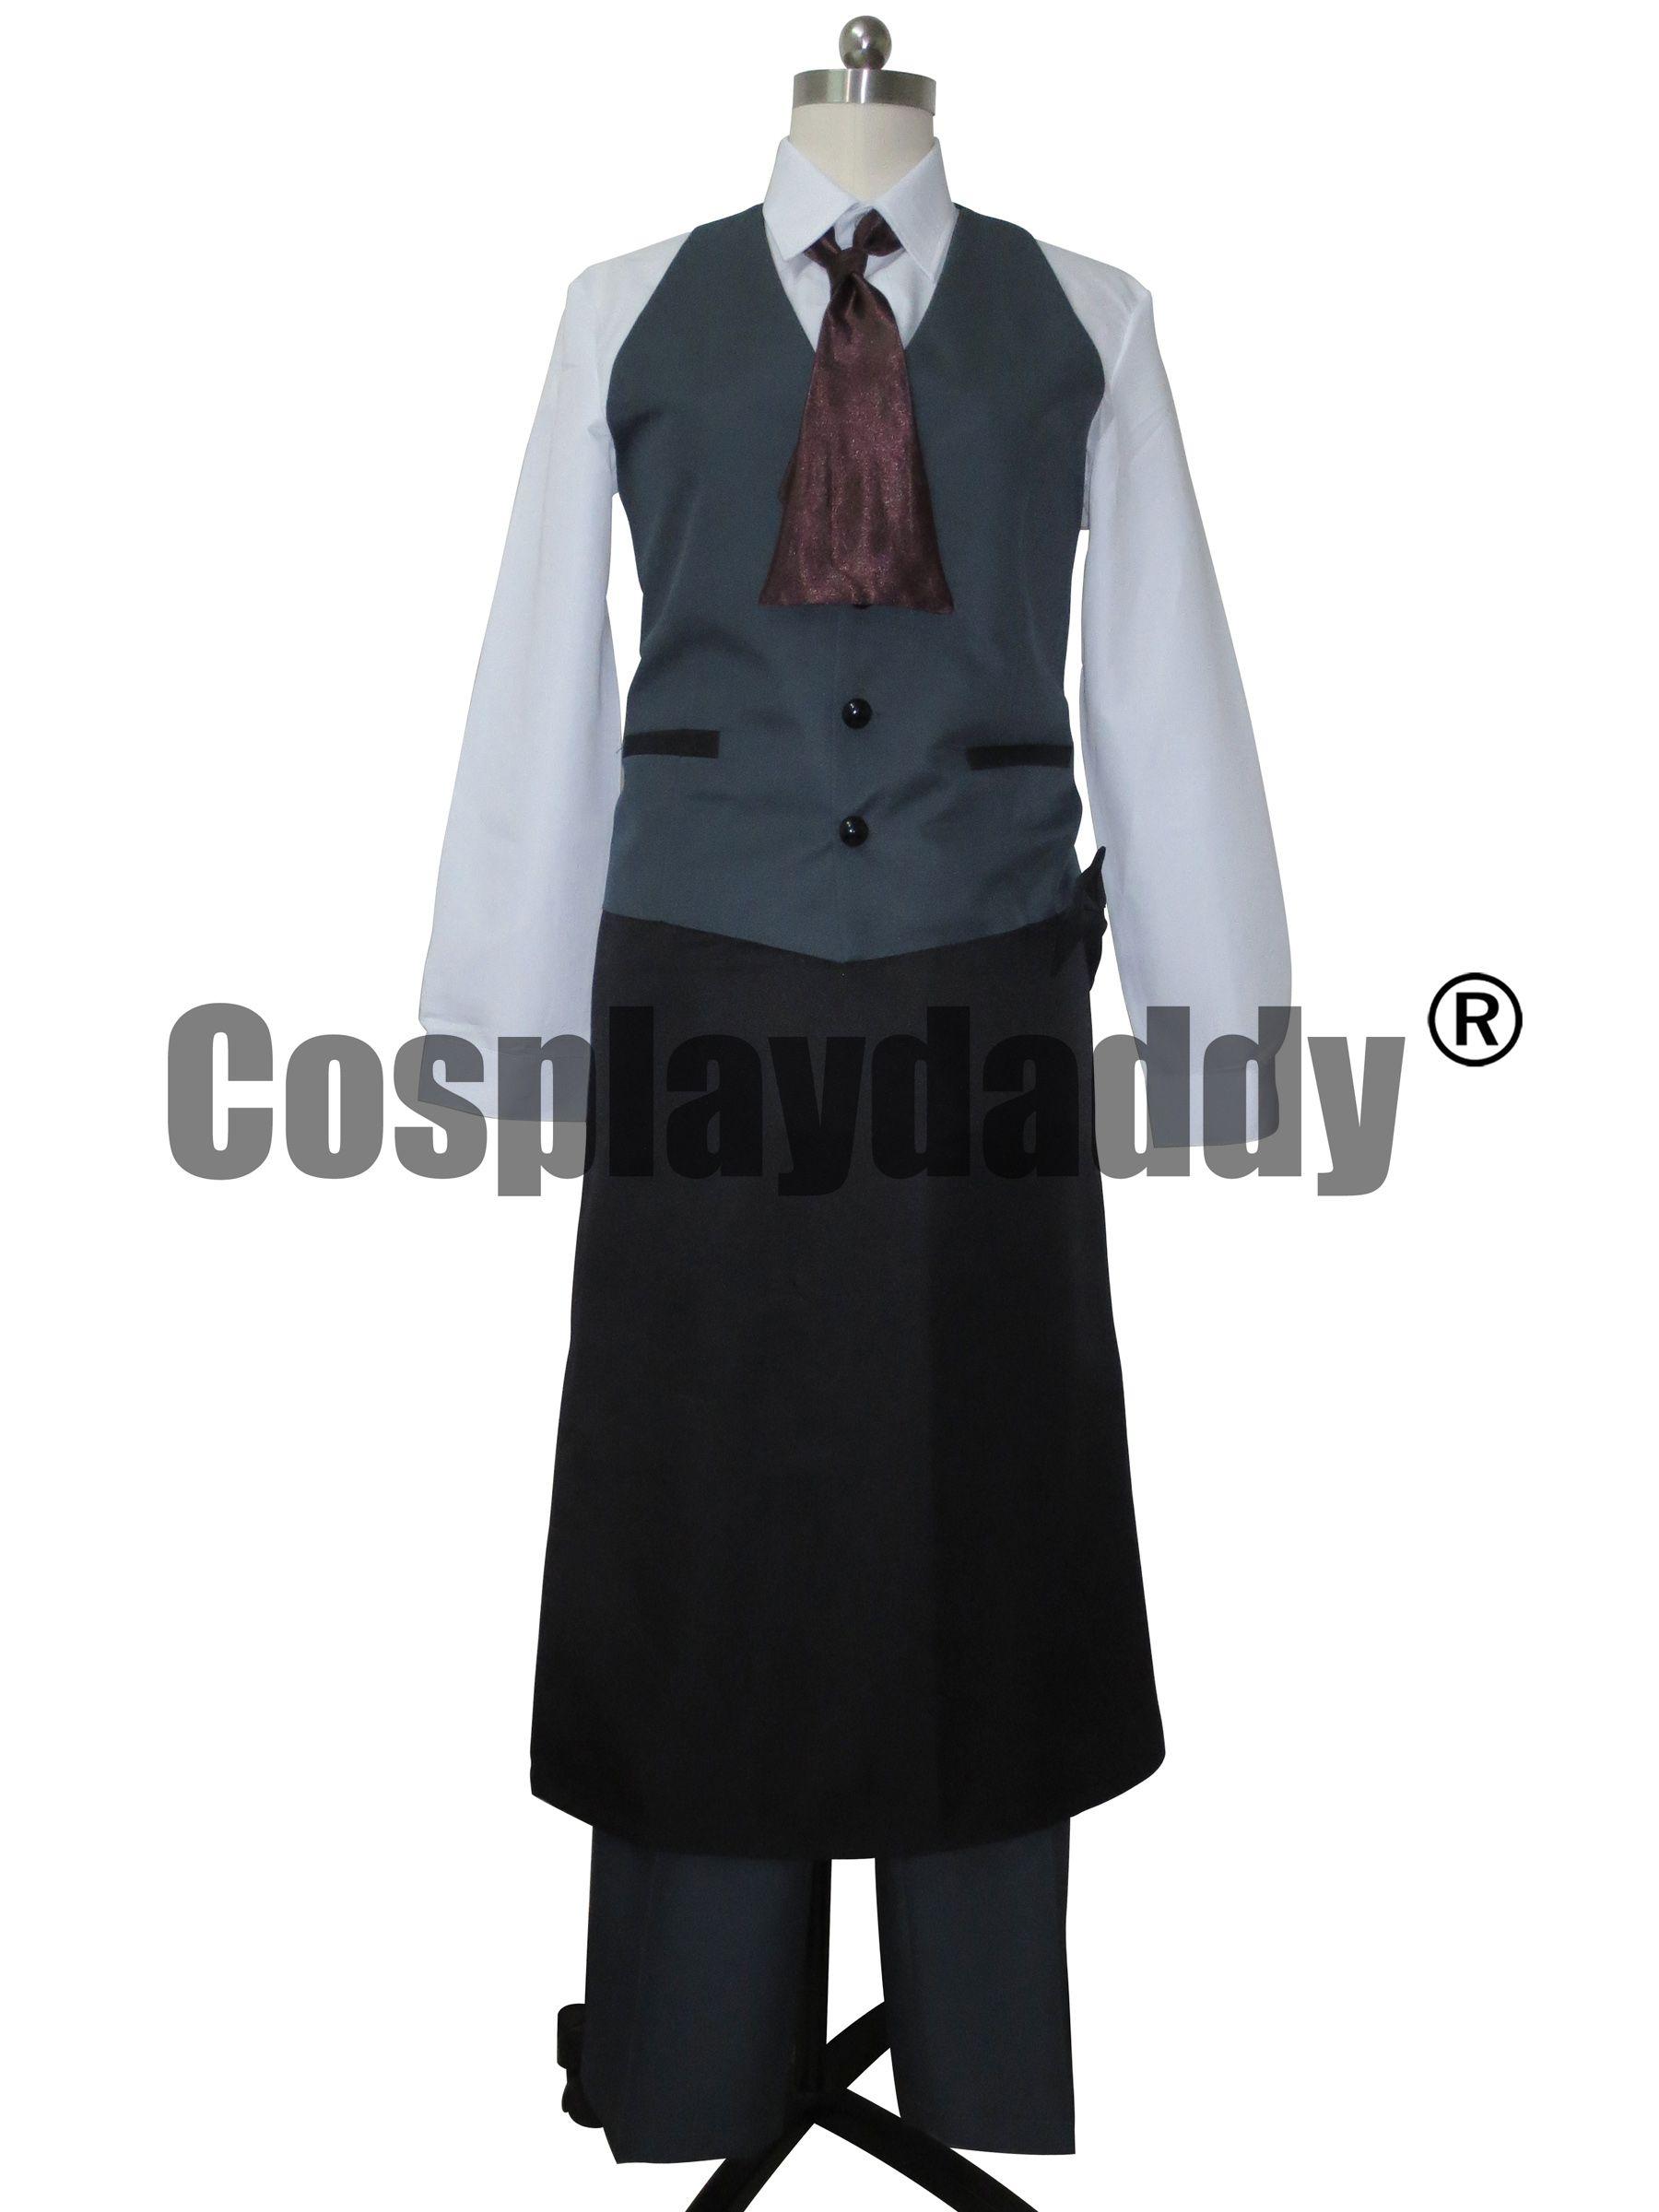 Tokyo Ghoul Ken Kaneki traje de cosplay uniforme personalizado para Coffeehouse Waiter